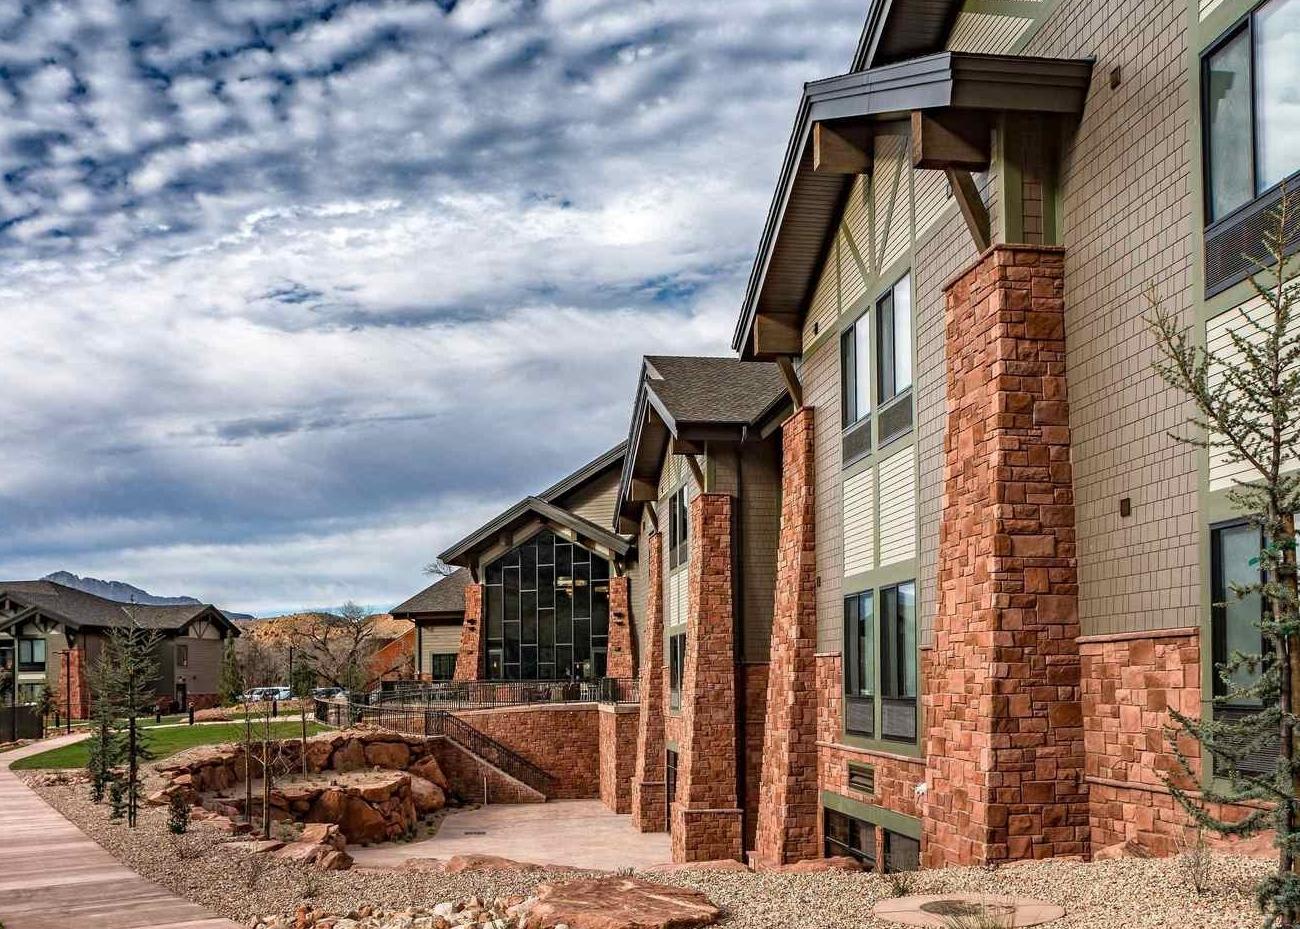 Springhill Suites Outside.jpg